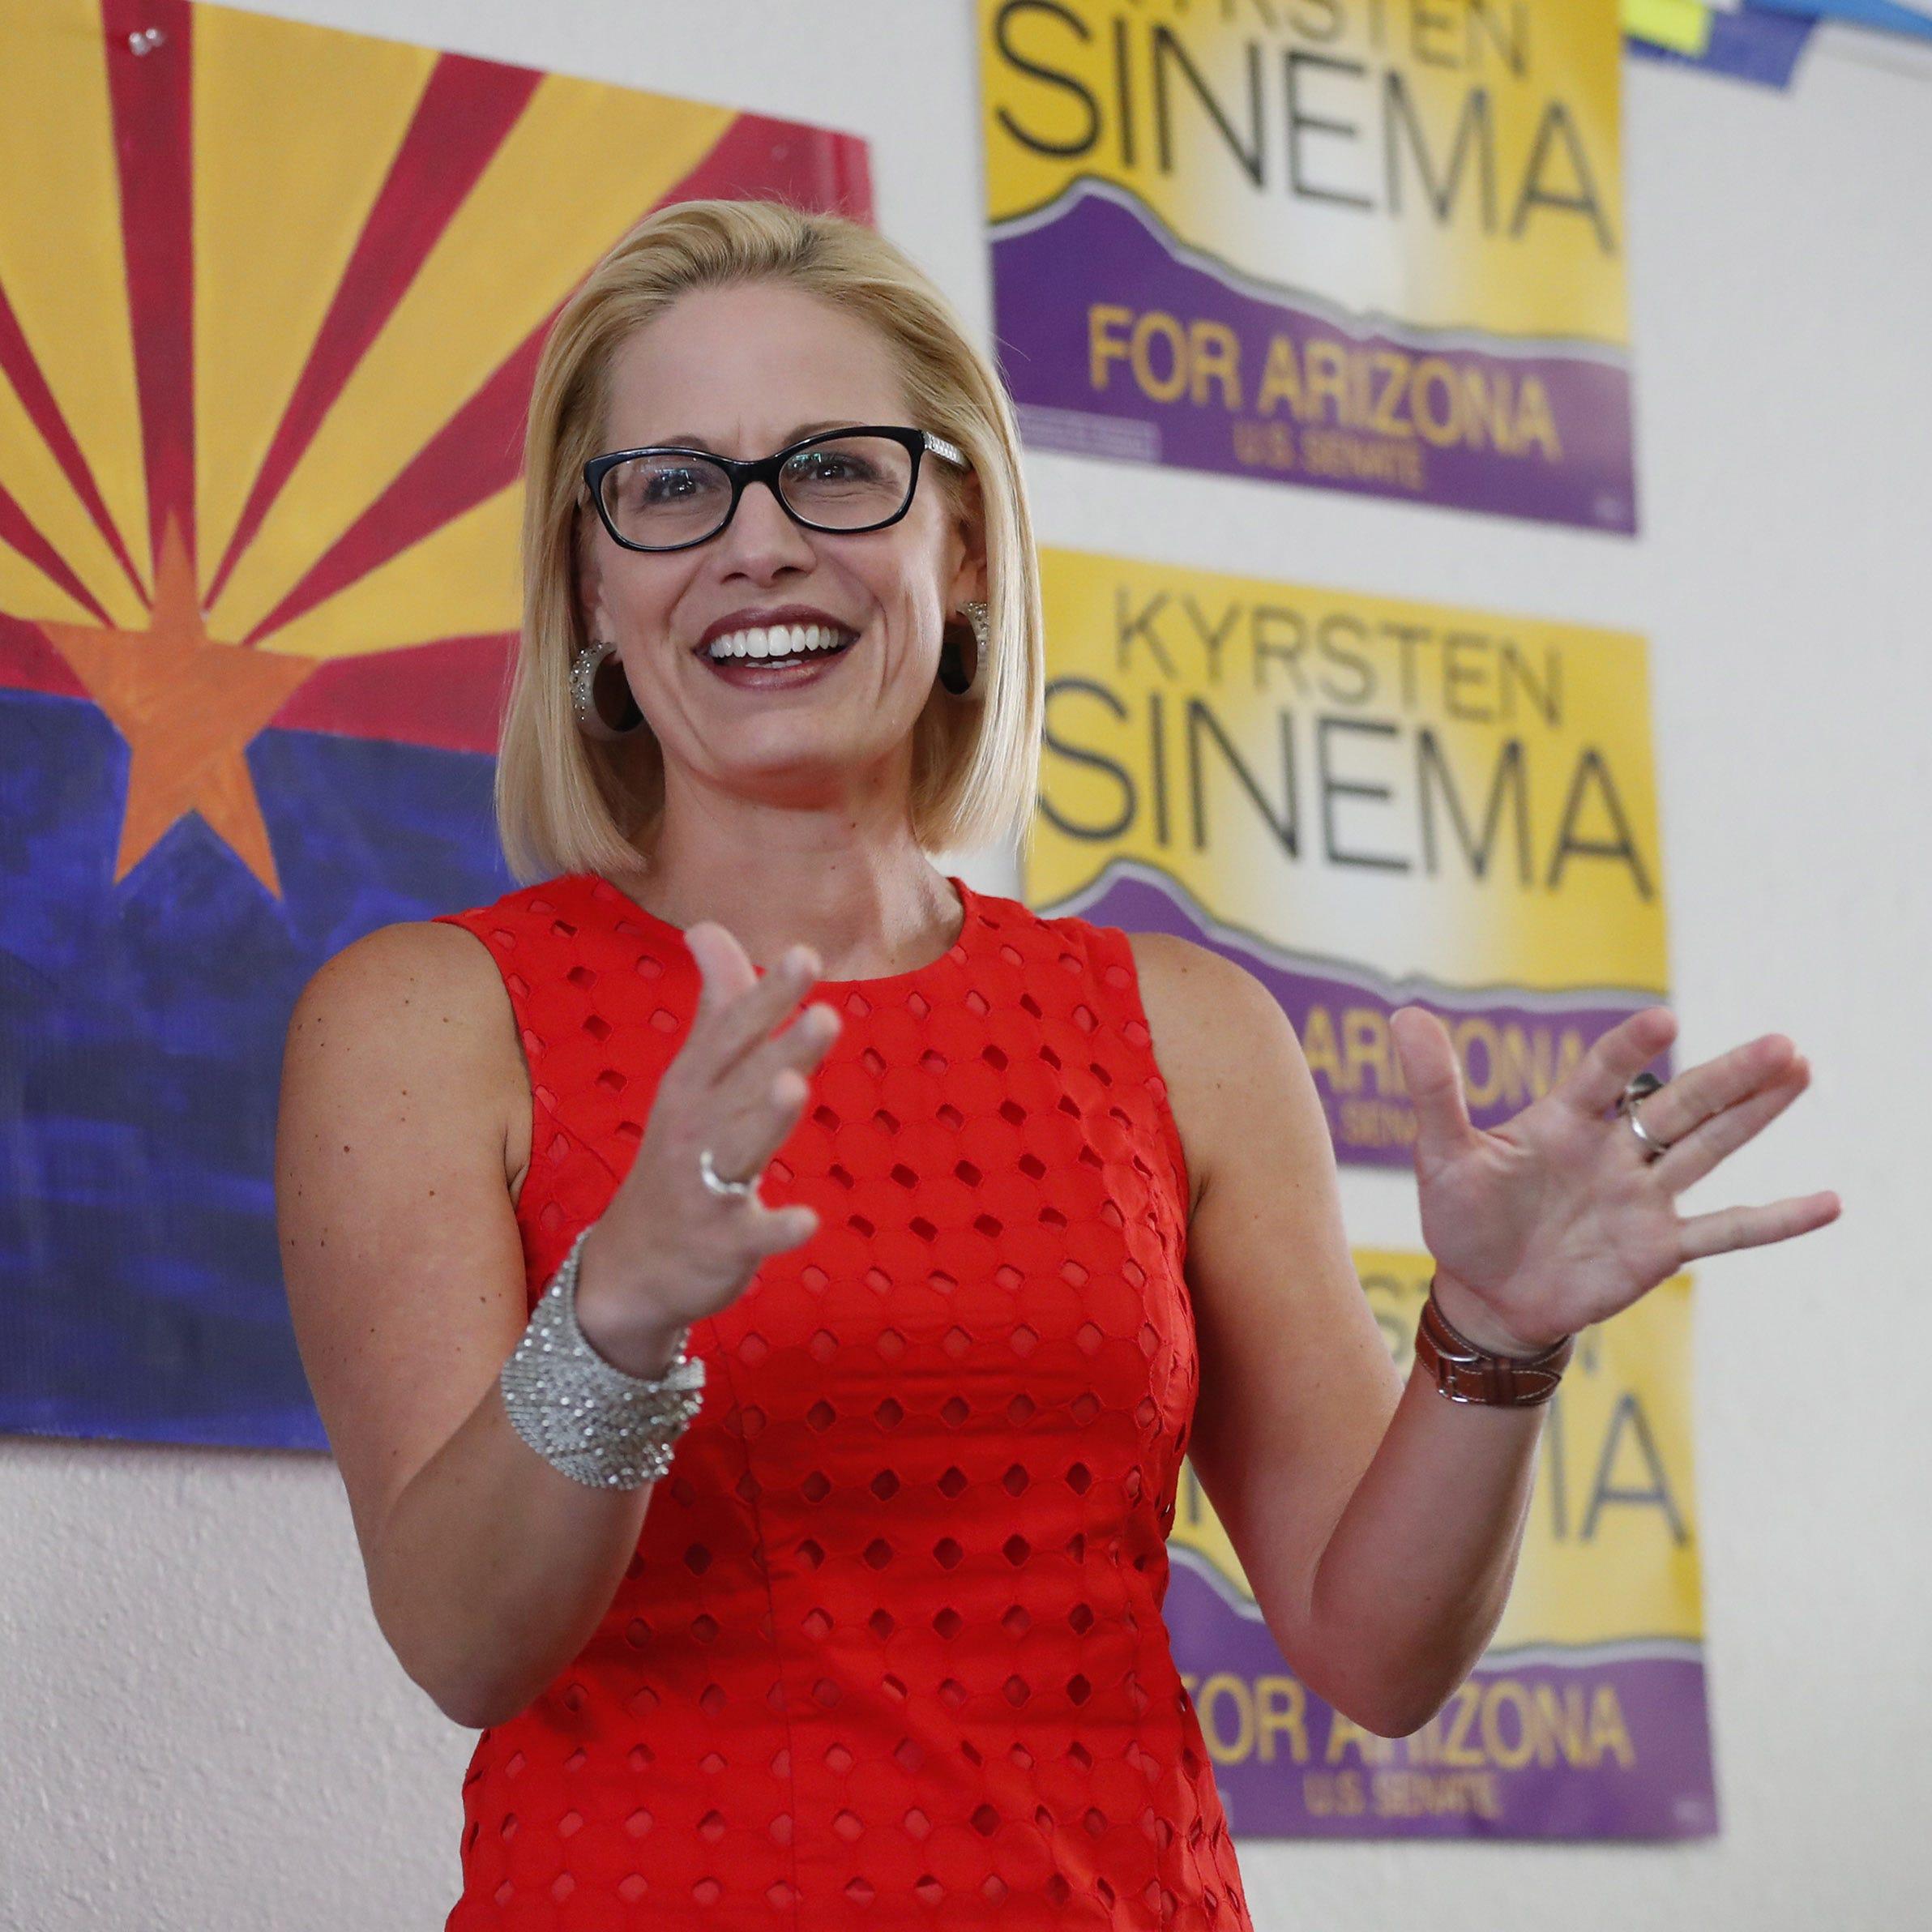 Kyrsten Sinema widens lead again over Martha McSally in pivotal day for Arizona's U.S. Senate race